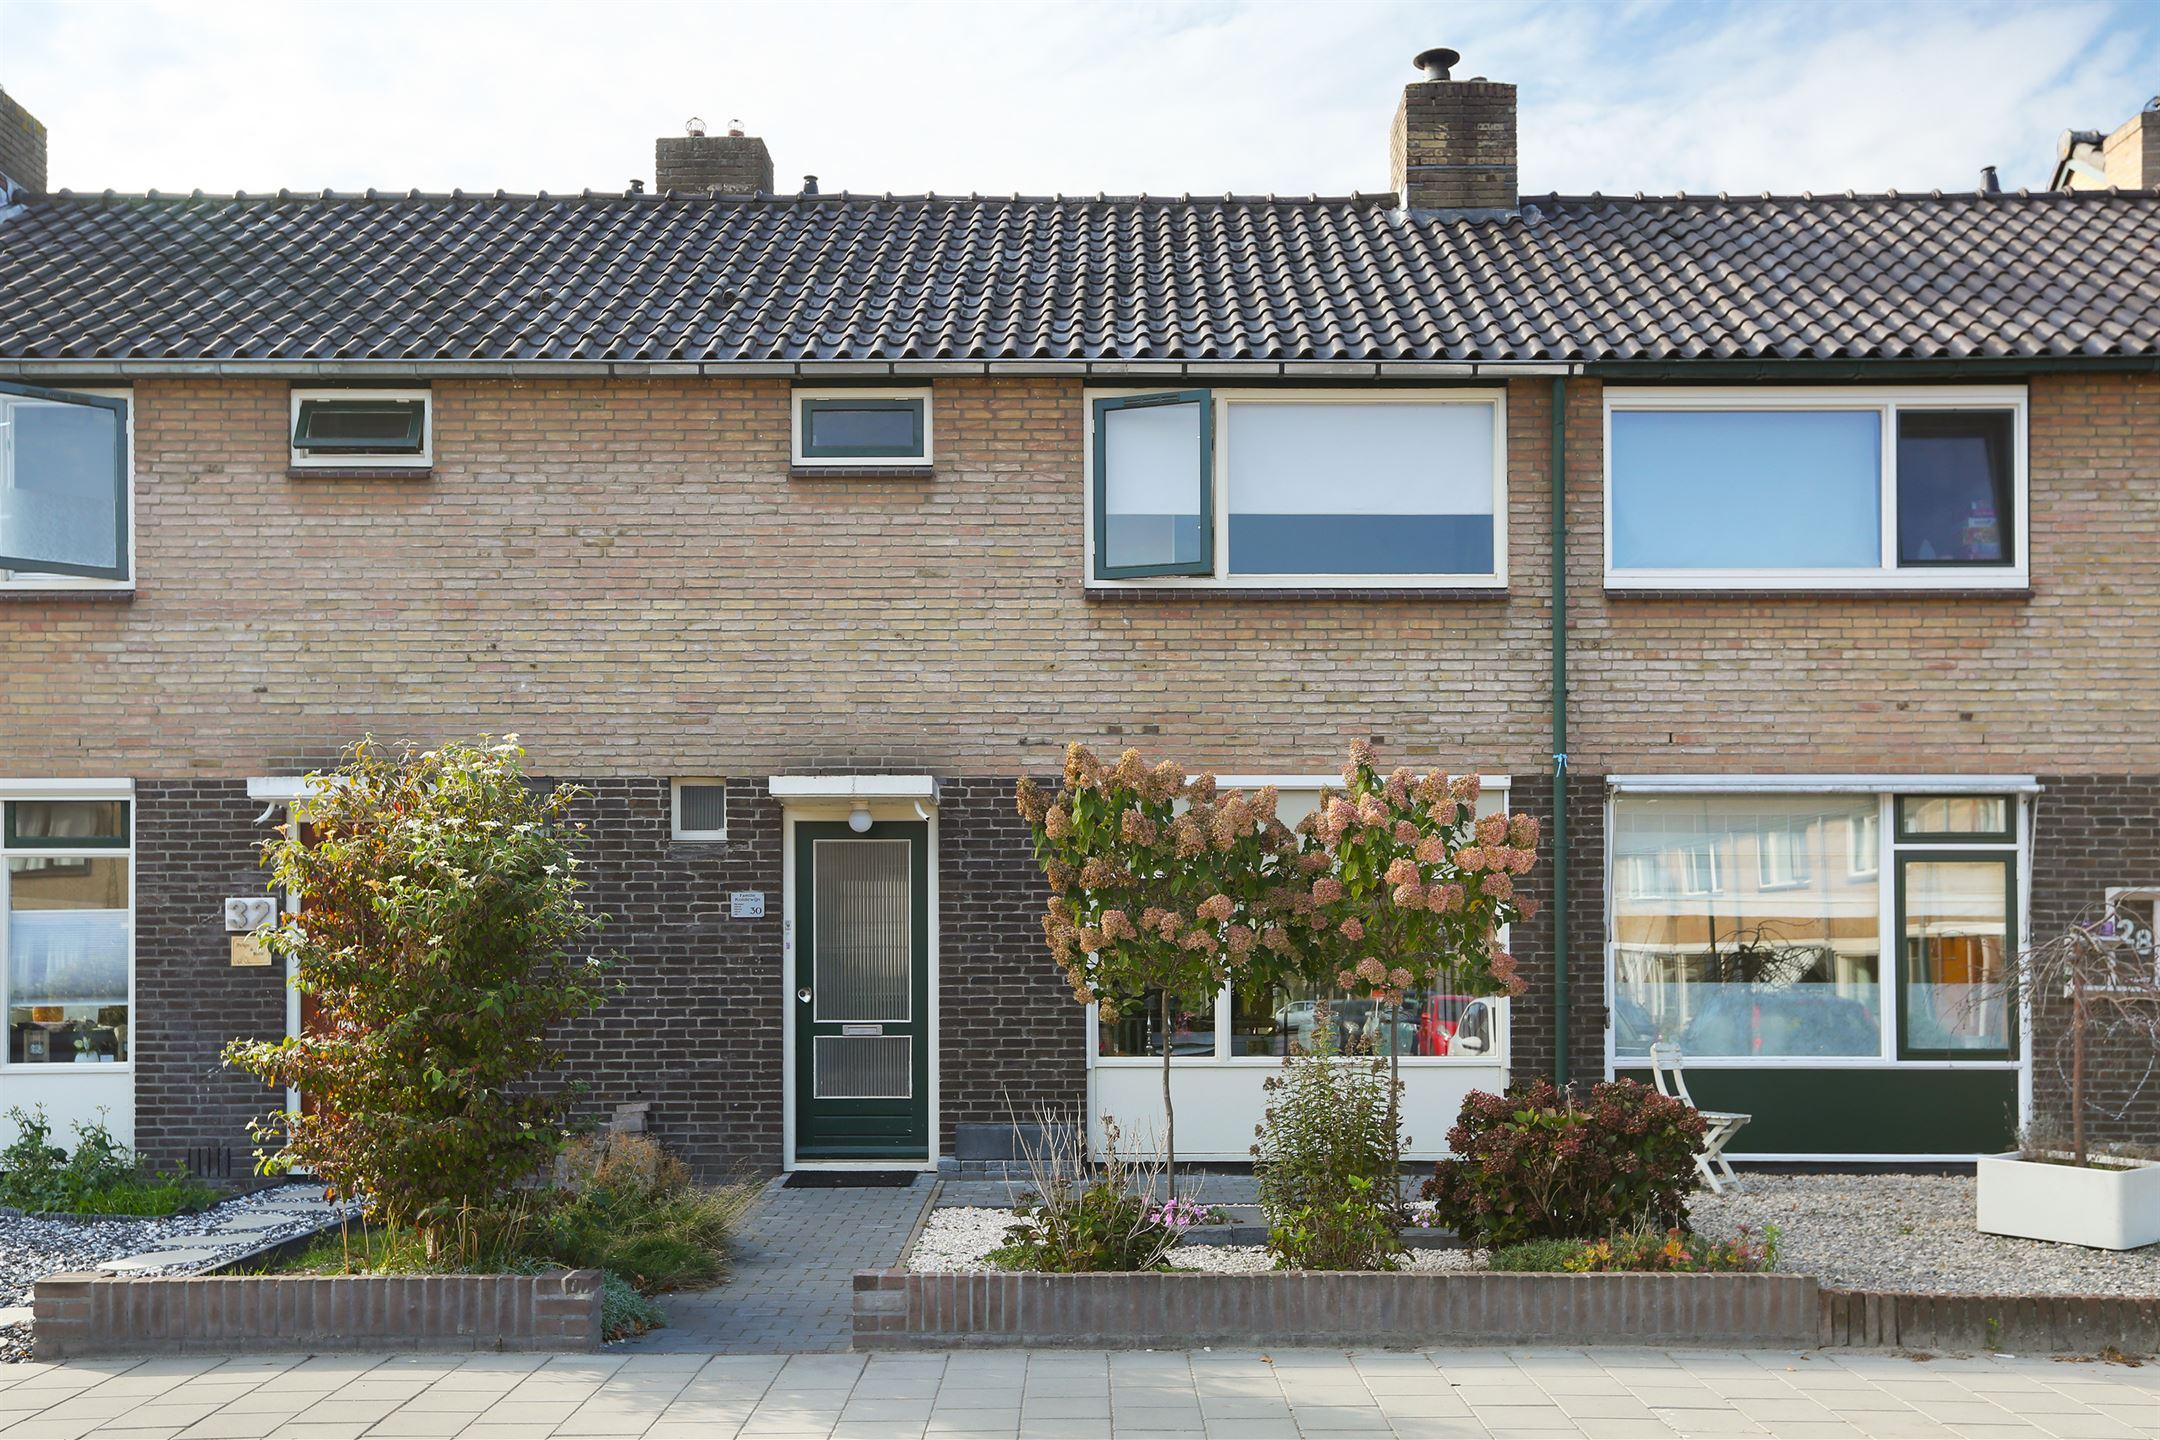 Keuken Badkamer Apeldoorn : Huis te koop: dintel 30 7333 mc apeldoorn [funda]